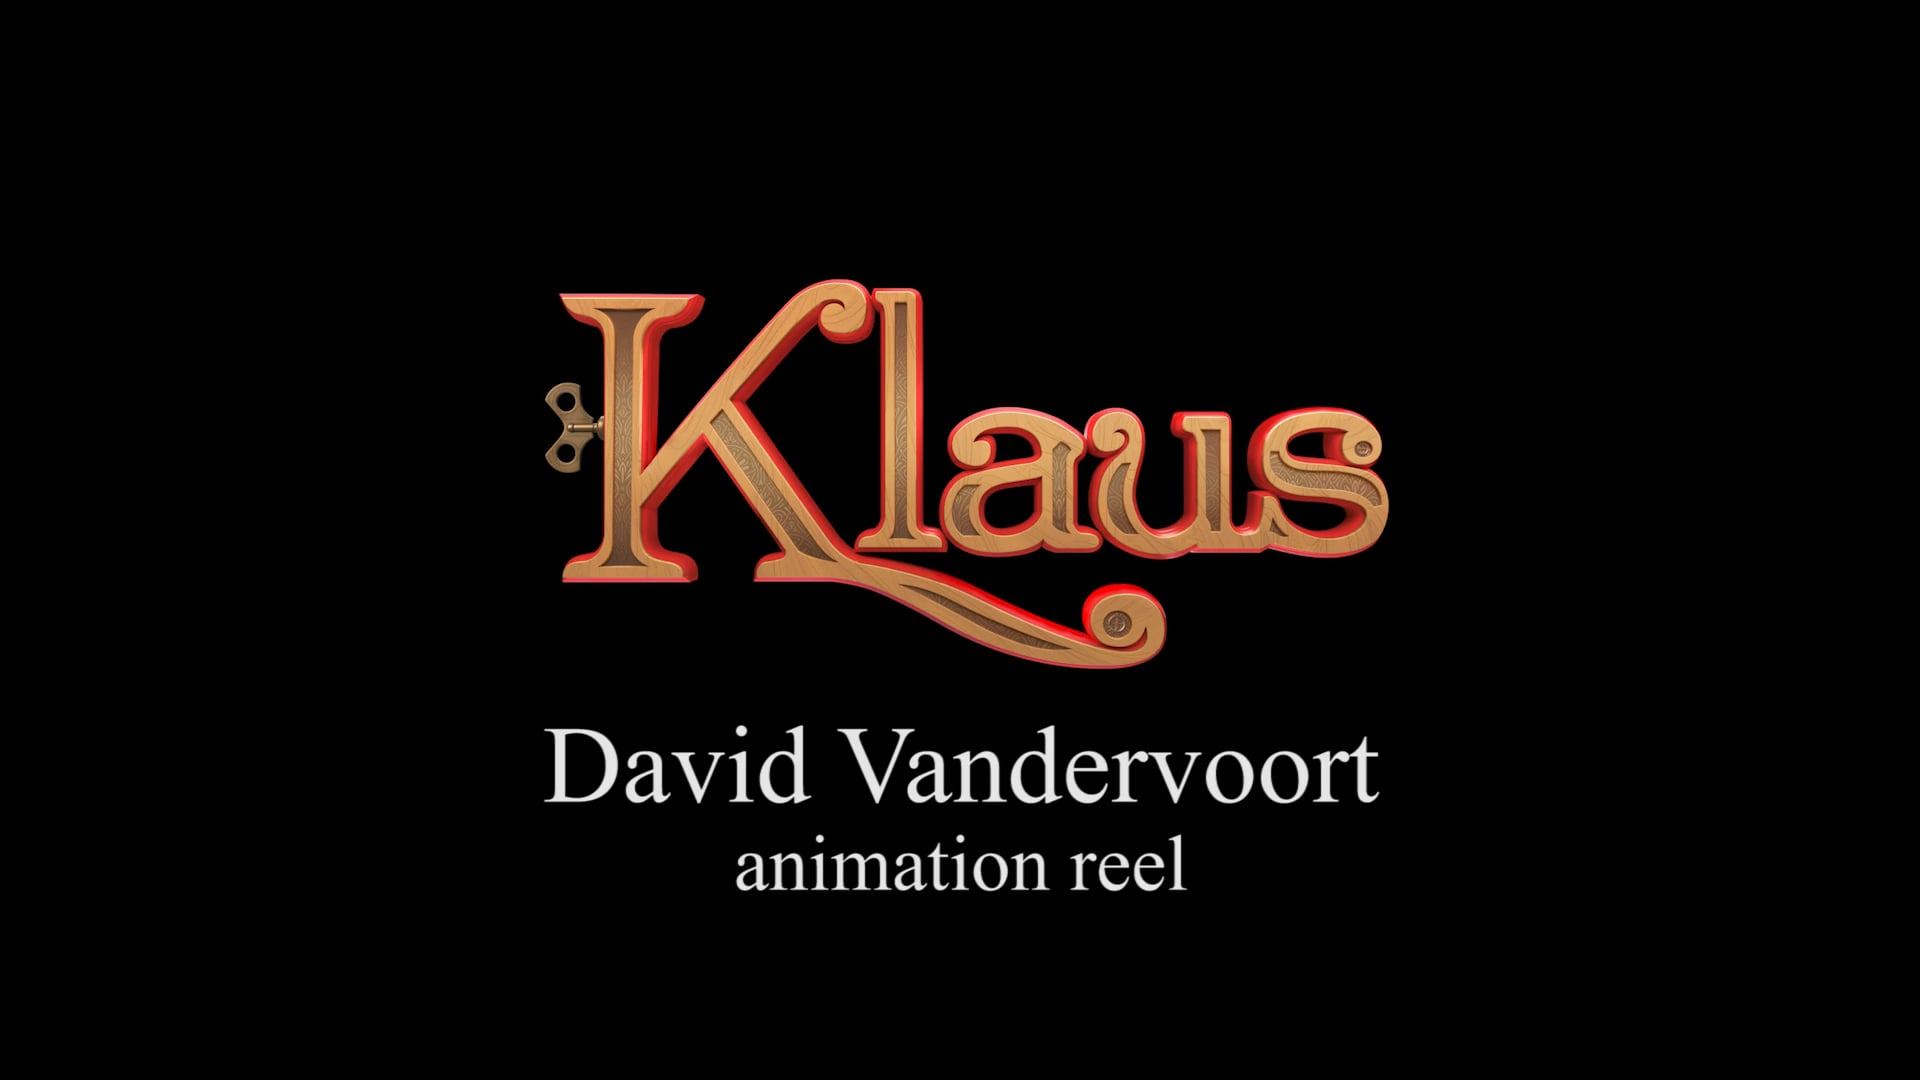 'Klaus' animation reel